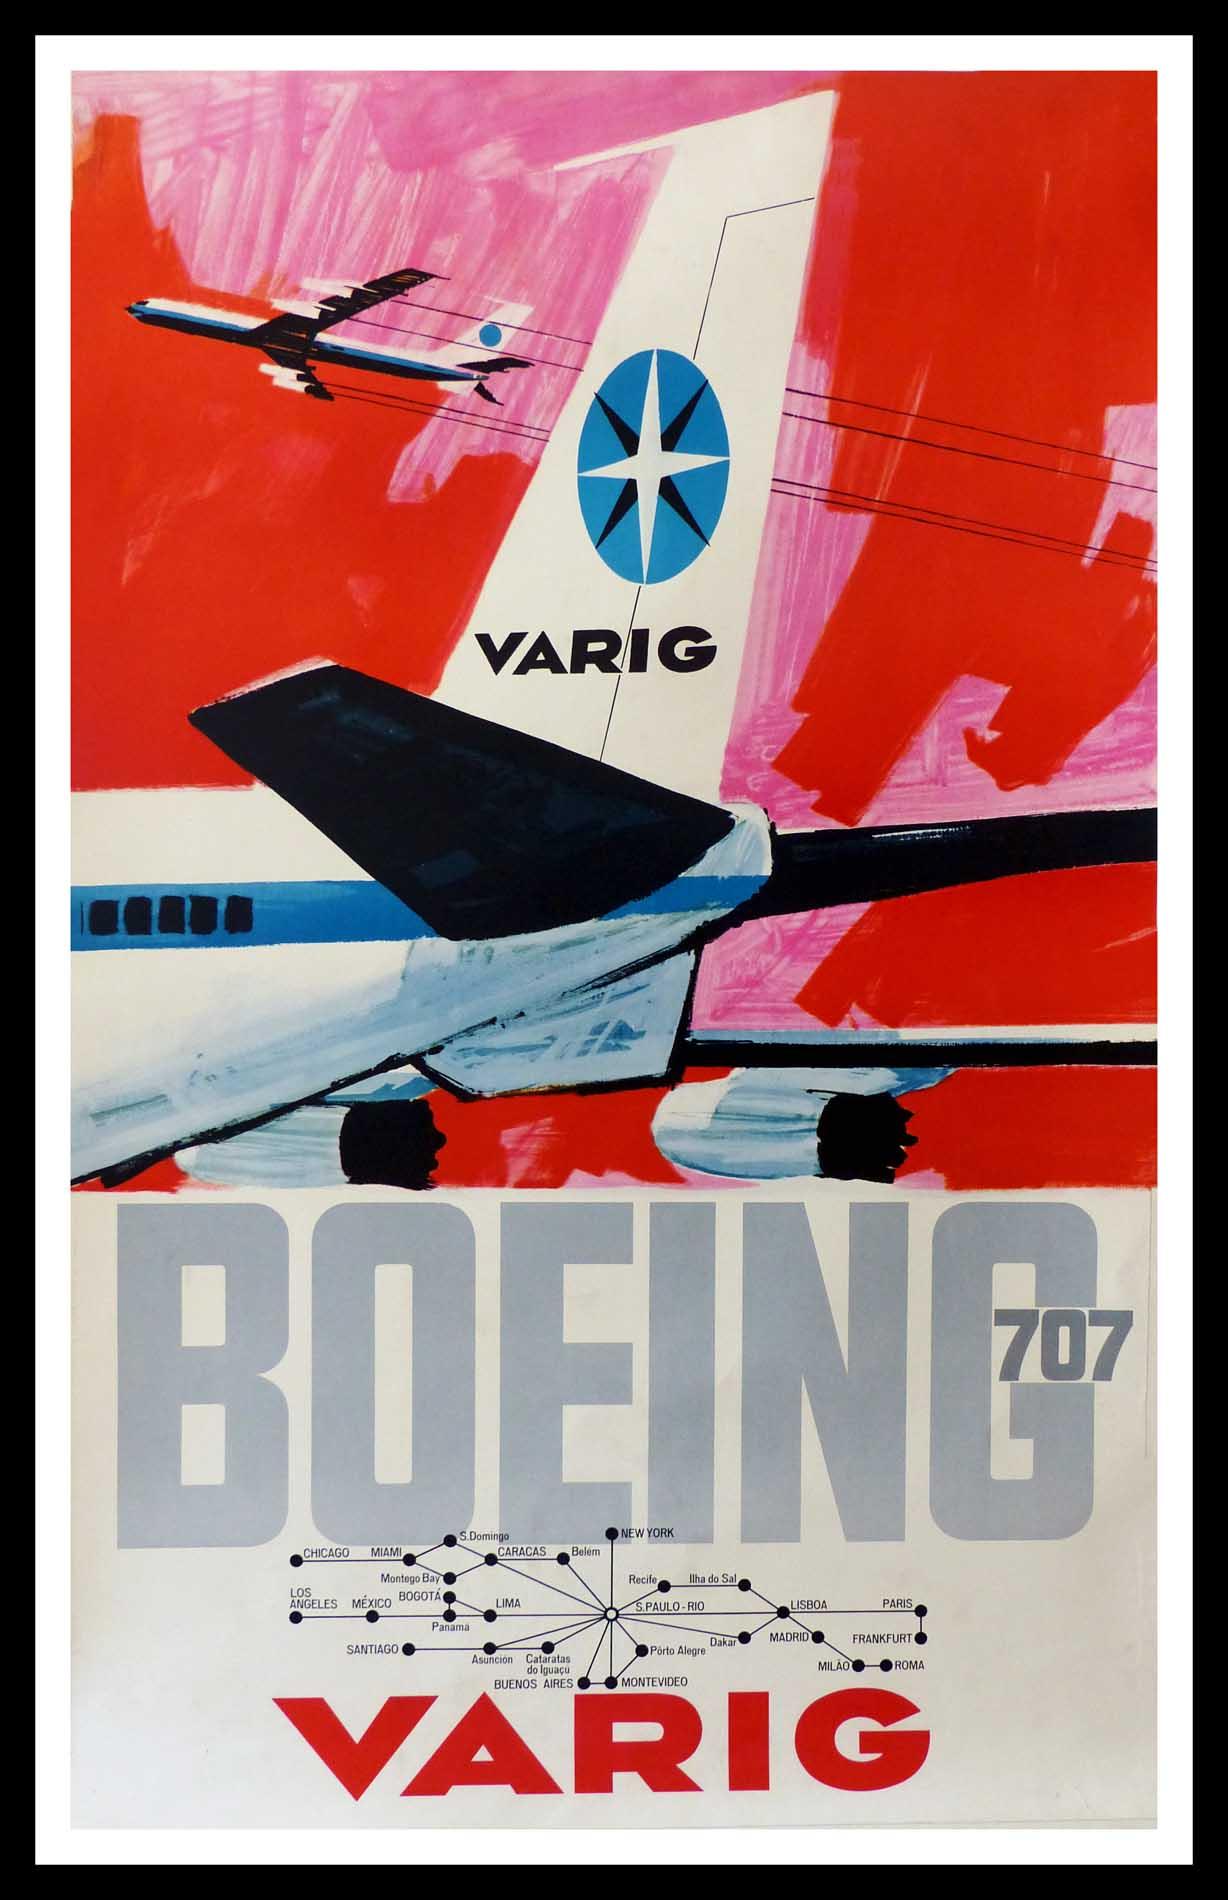 "(alt=""original vintage transportation poster, VARIG Boeing, Paris, New York, Buenos Aires, Brésil, circa 1950"")"